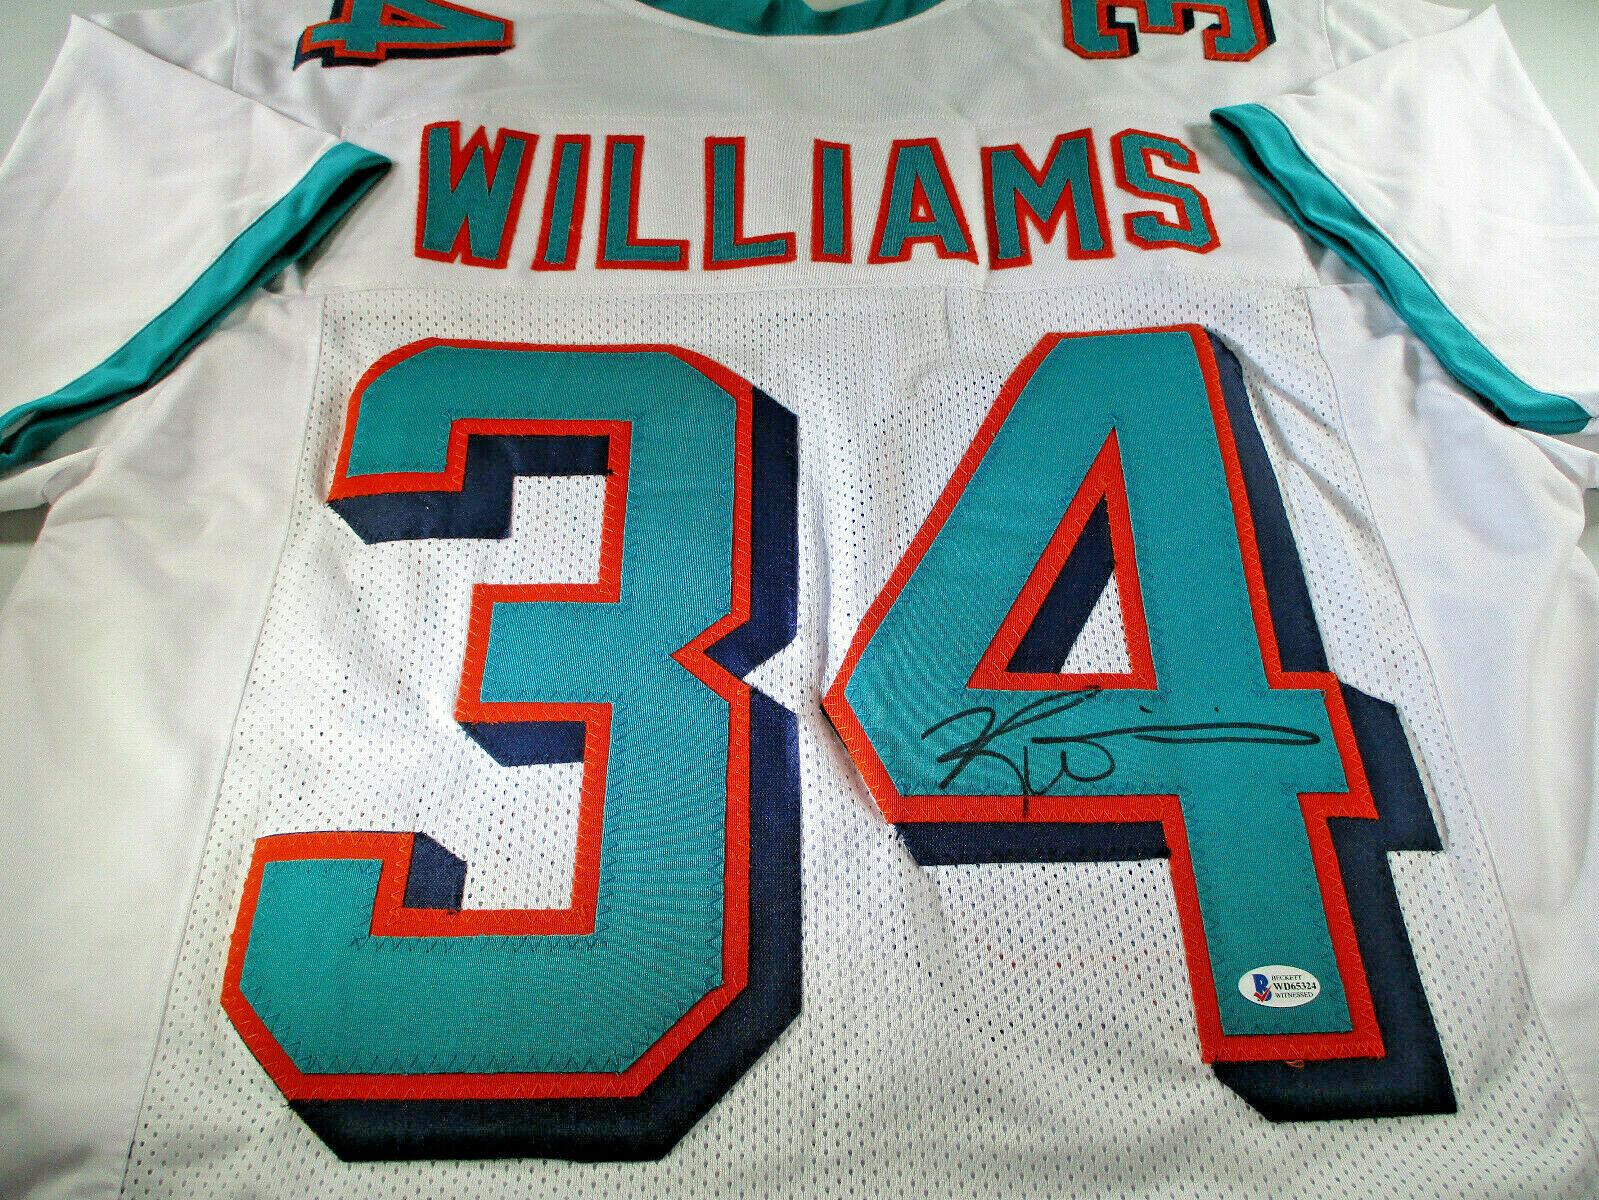 RICKY WILLIAMS / NCAA H.O.F / AUTOGRAPHED MIAMI DOLPHINS CUSTOM JERSEY / BECKETT